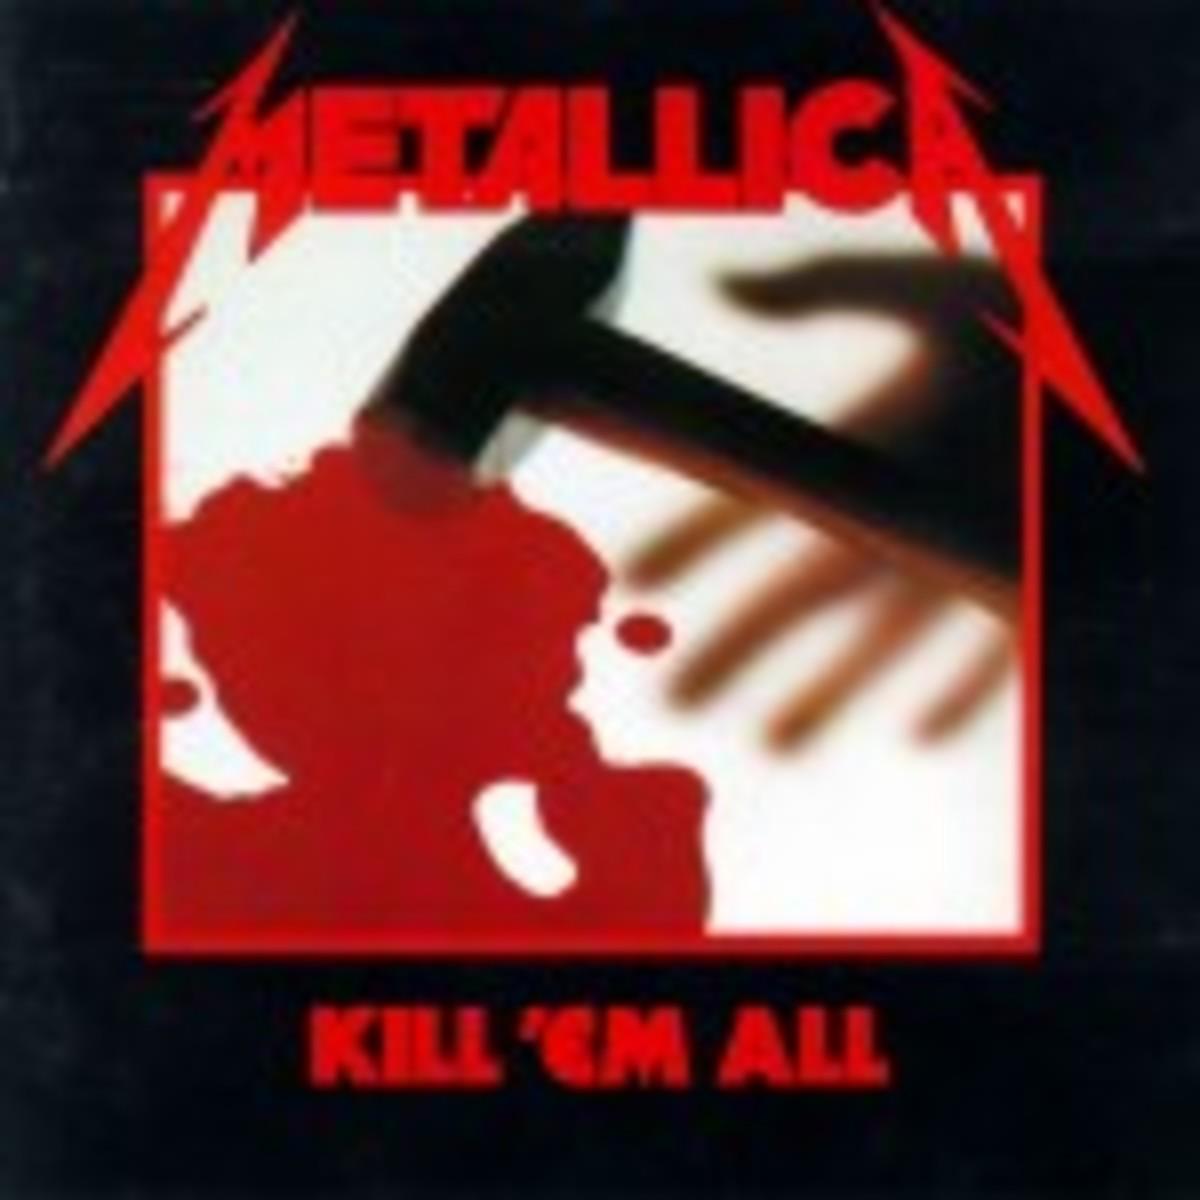 Metallica_KillEmAll